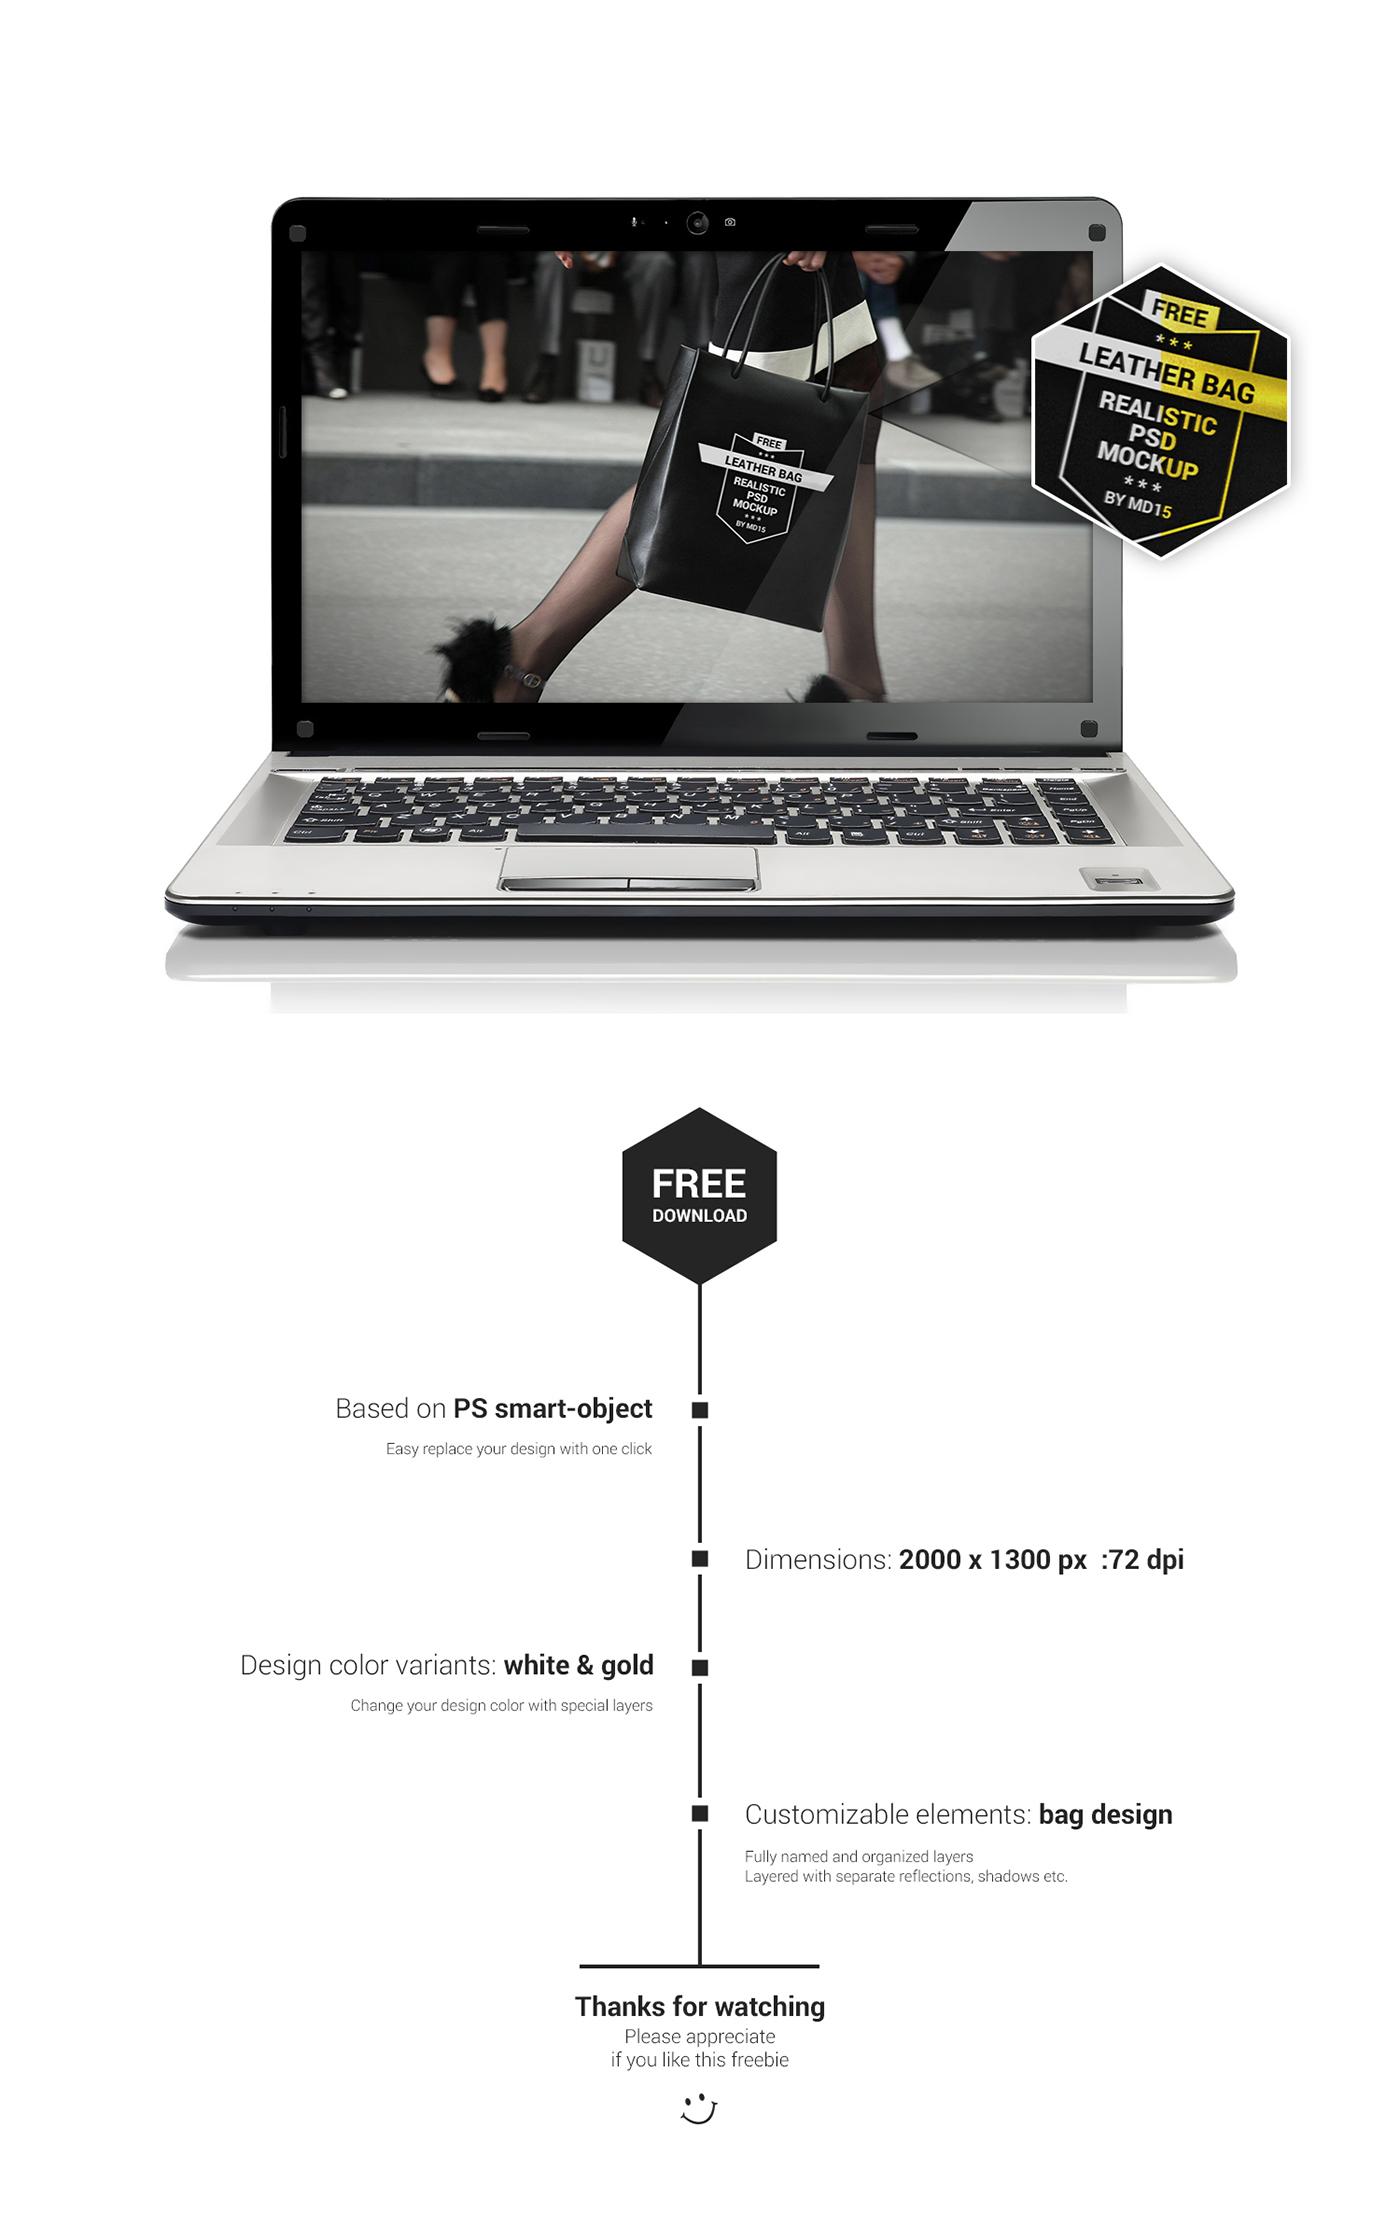 leather bag Shopping free psd Mockup branding  logo design